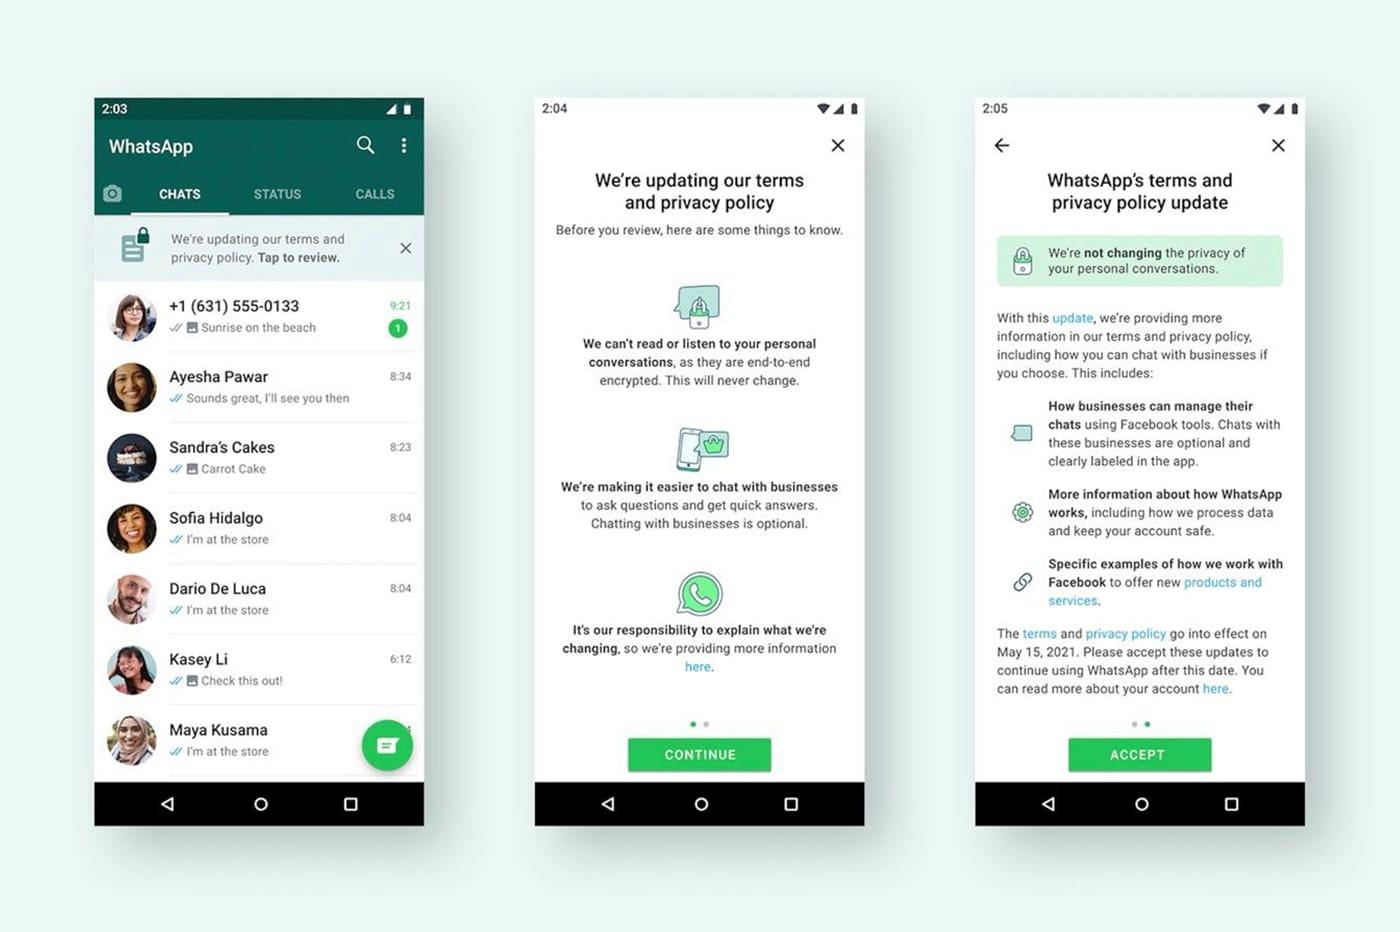 whatsapp-transparence-banniere-informative-politique-confidentialite